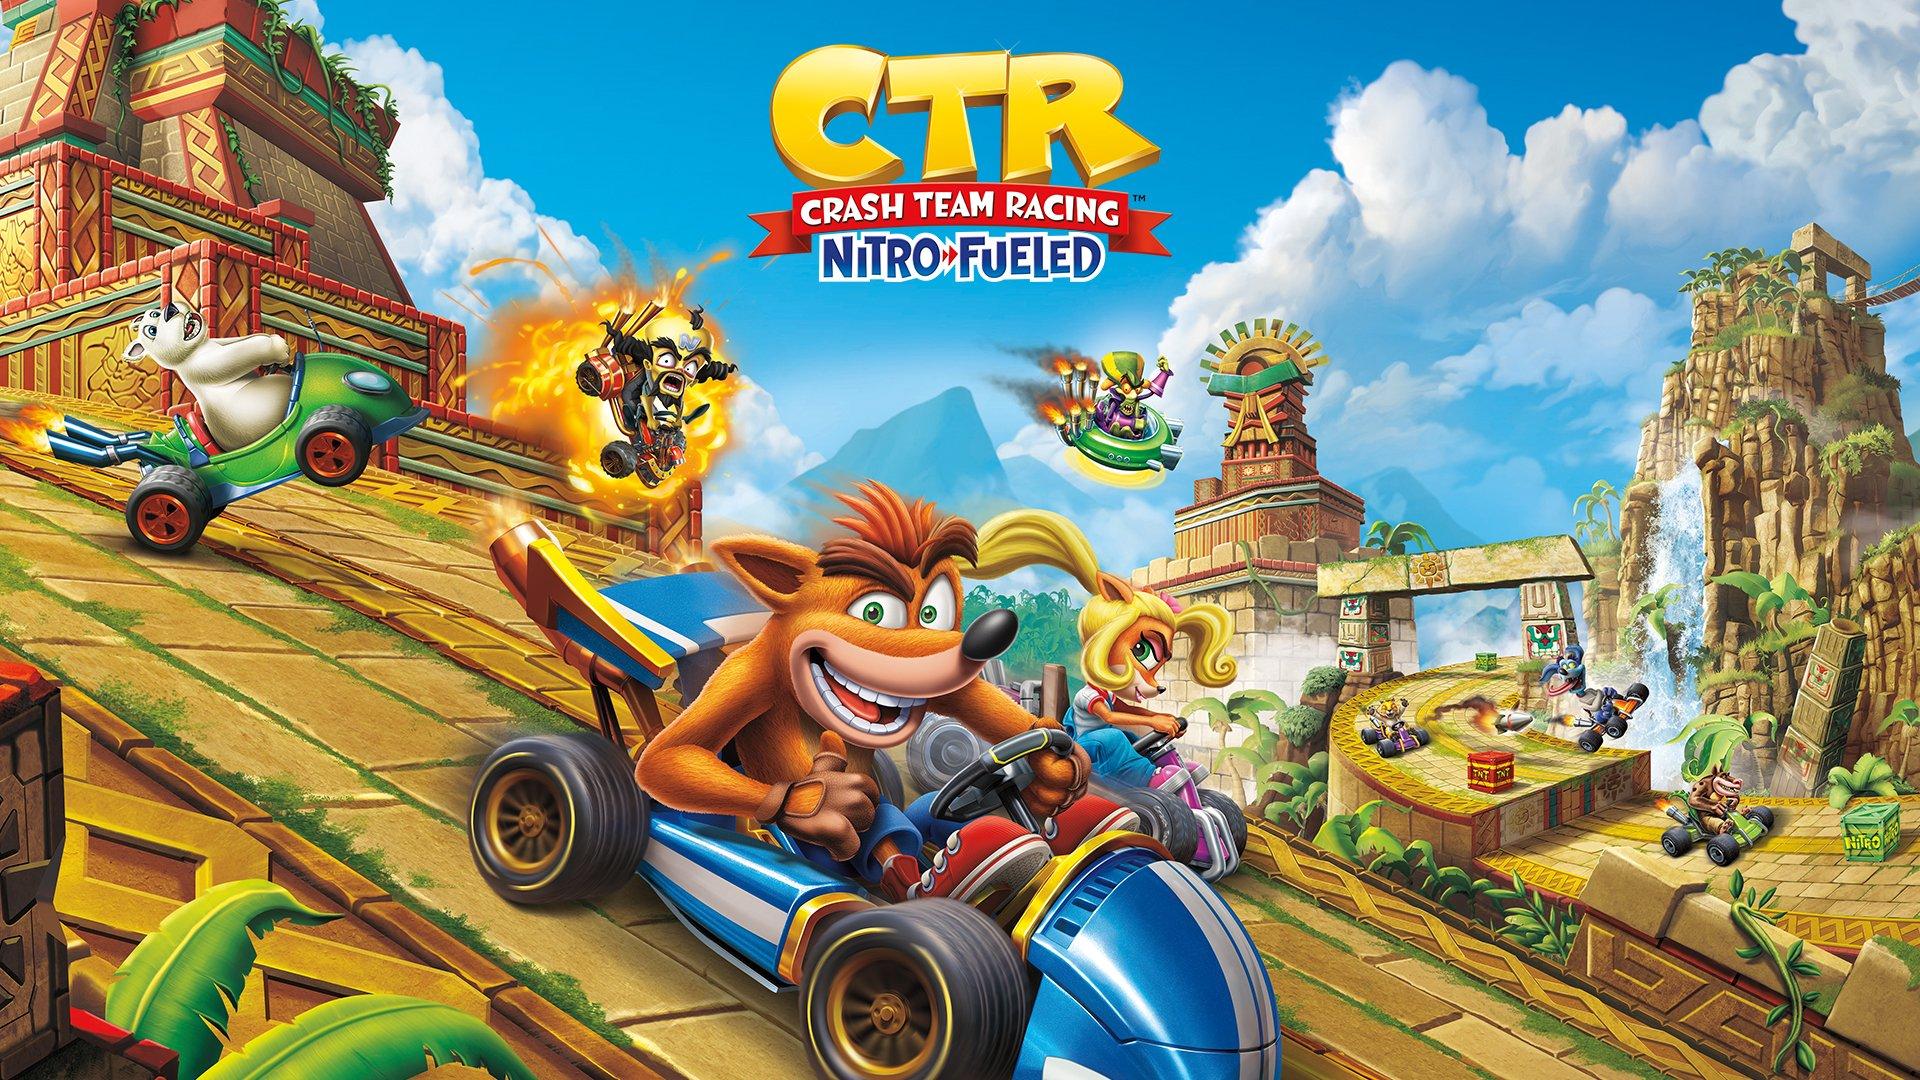 Crash Team Racing Nitro Fueled 04 24 19 001